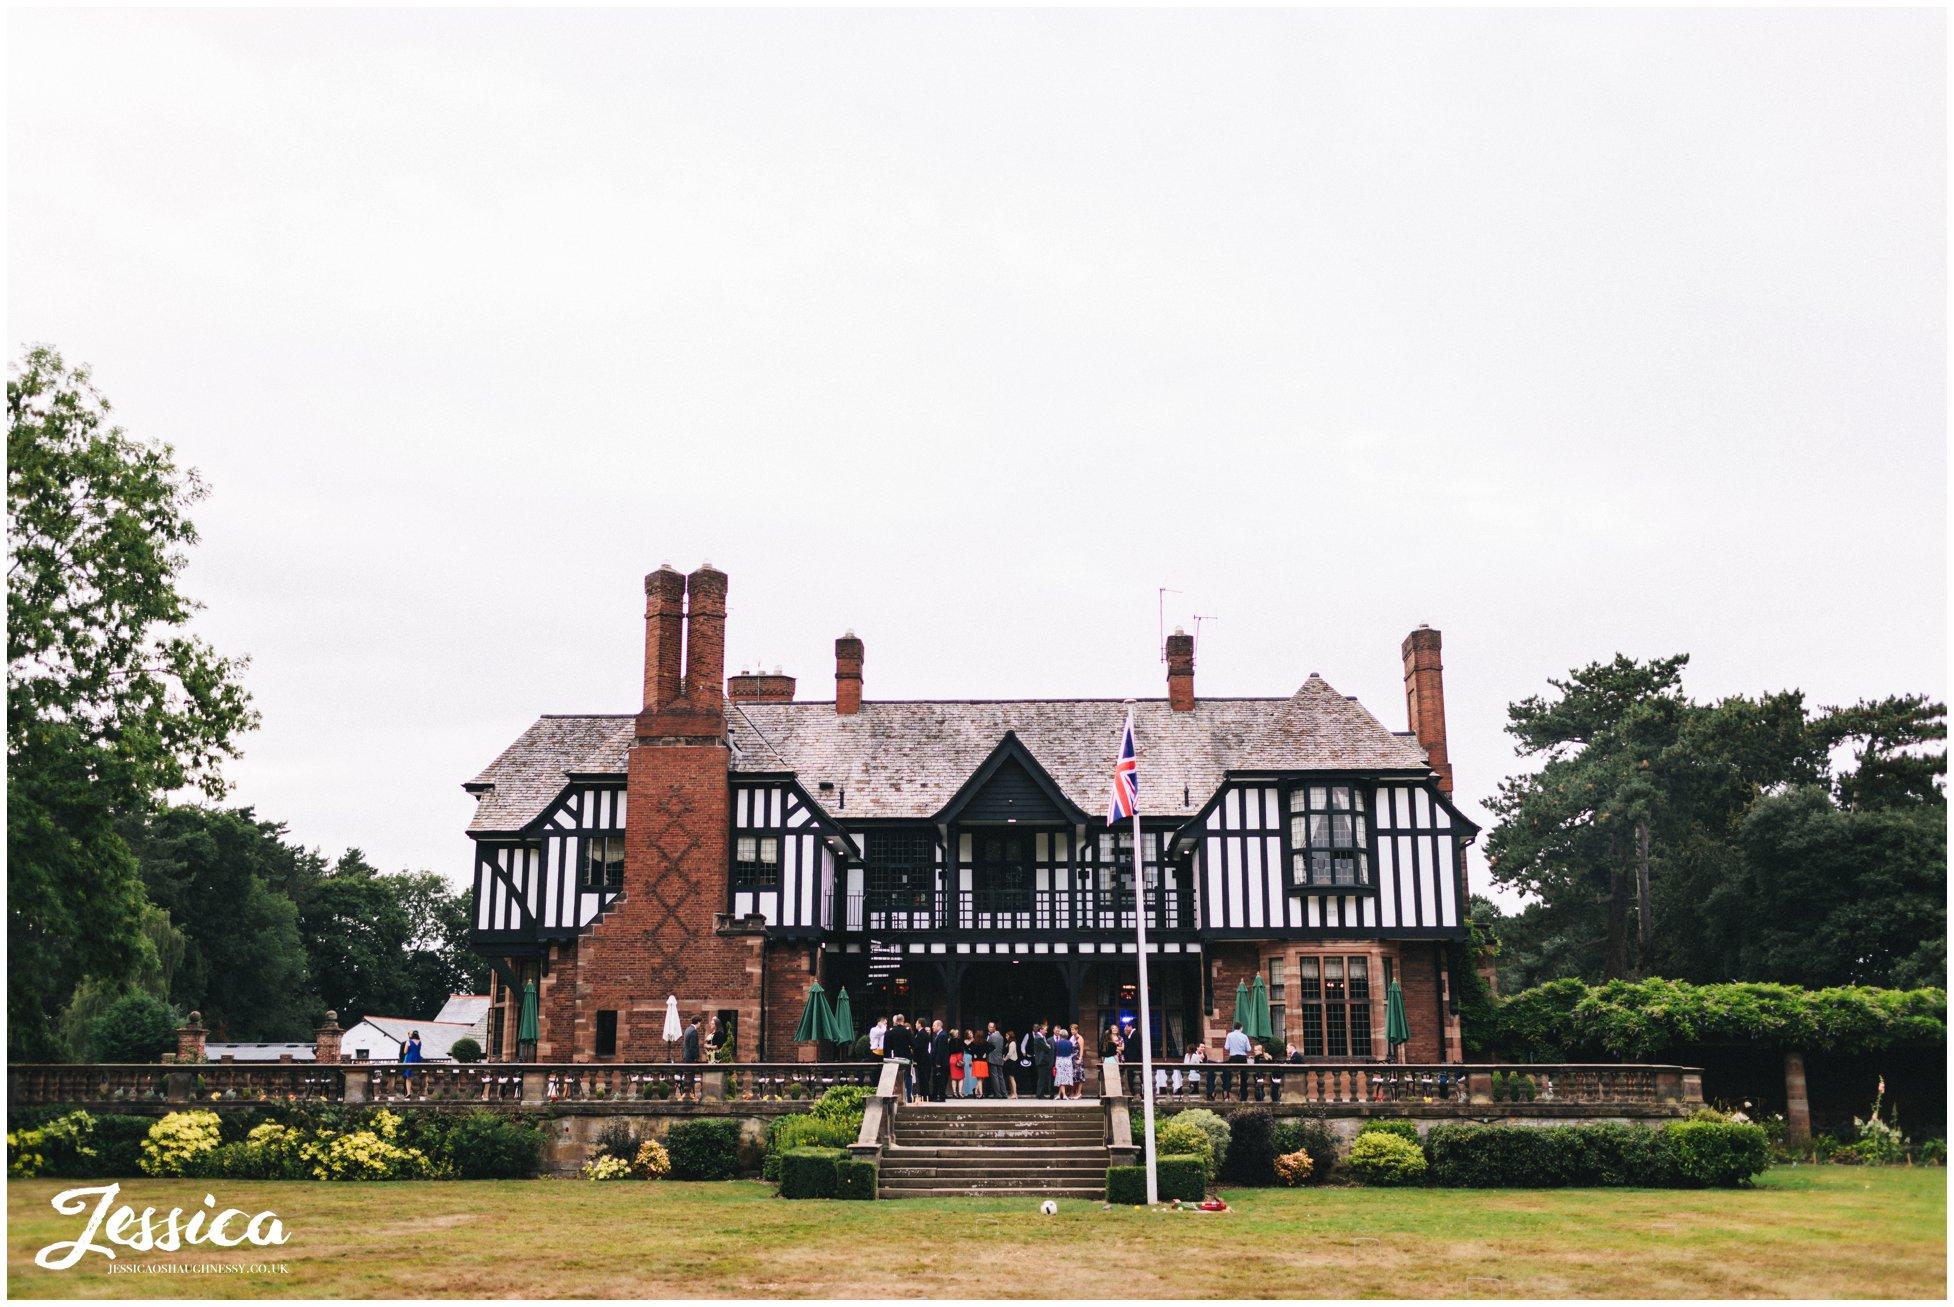 inglewood manor wedding venue in cheshire